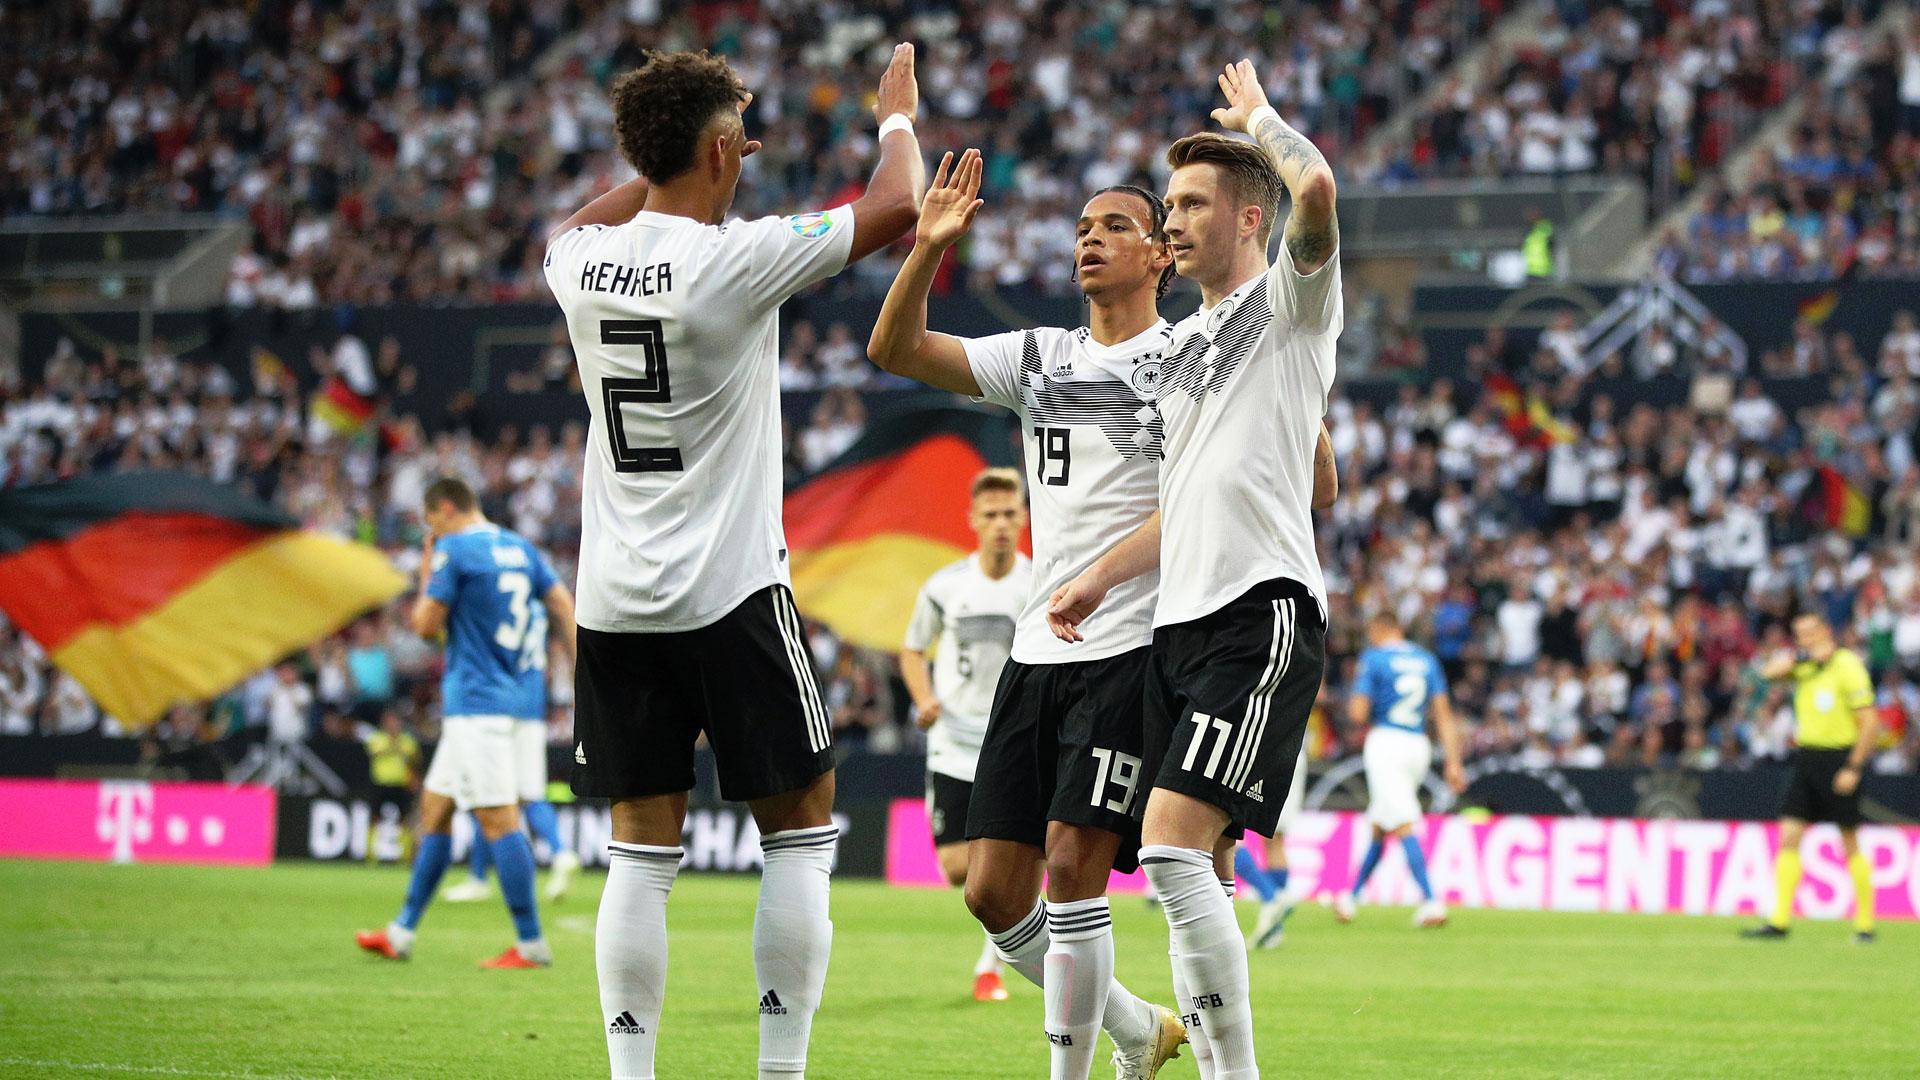 Deutschland Vs WeiГџrussland